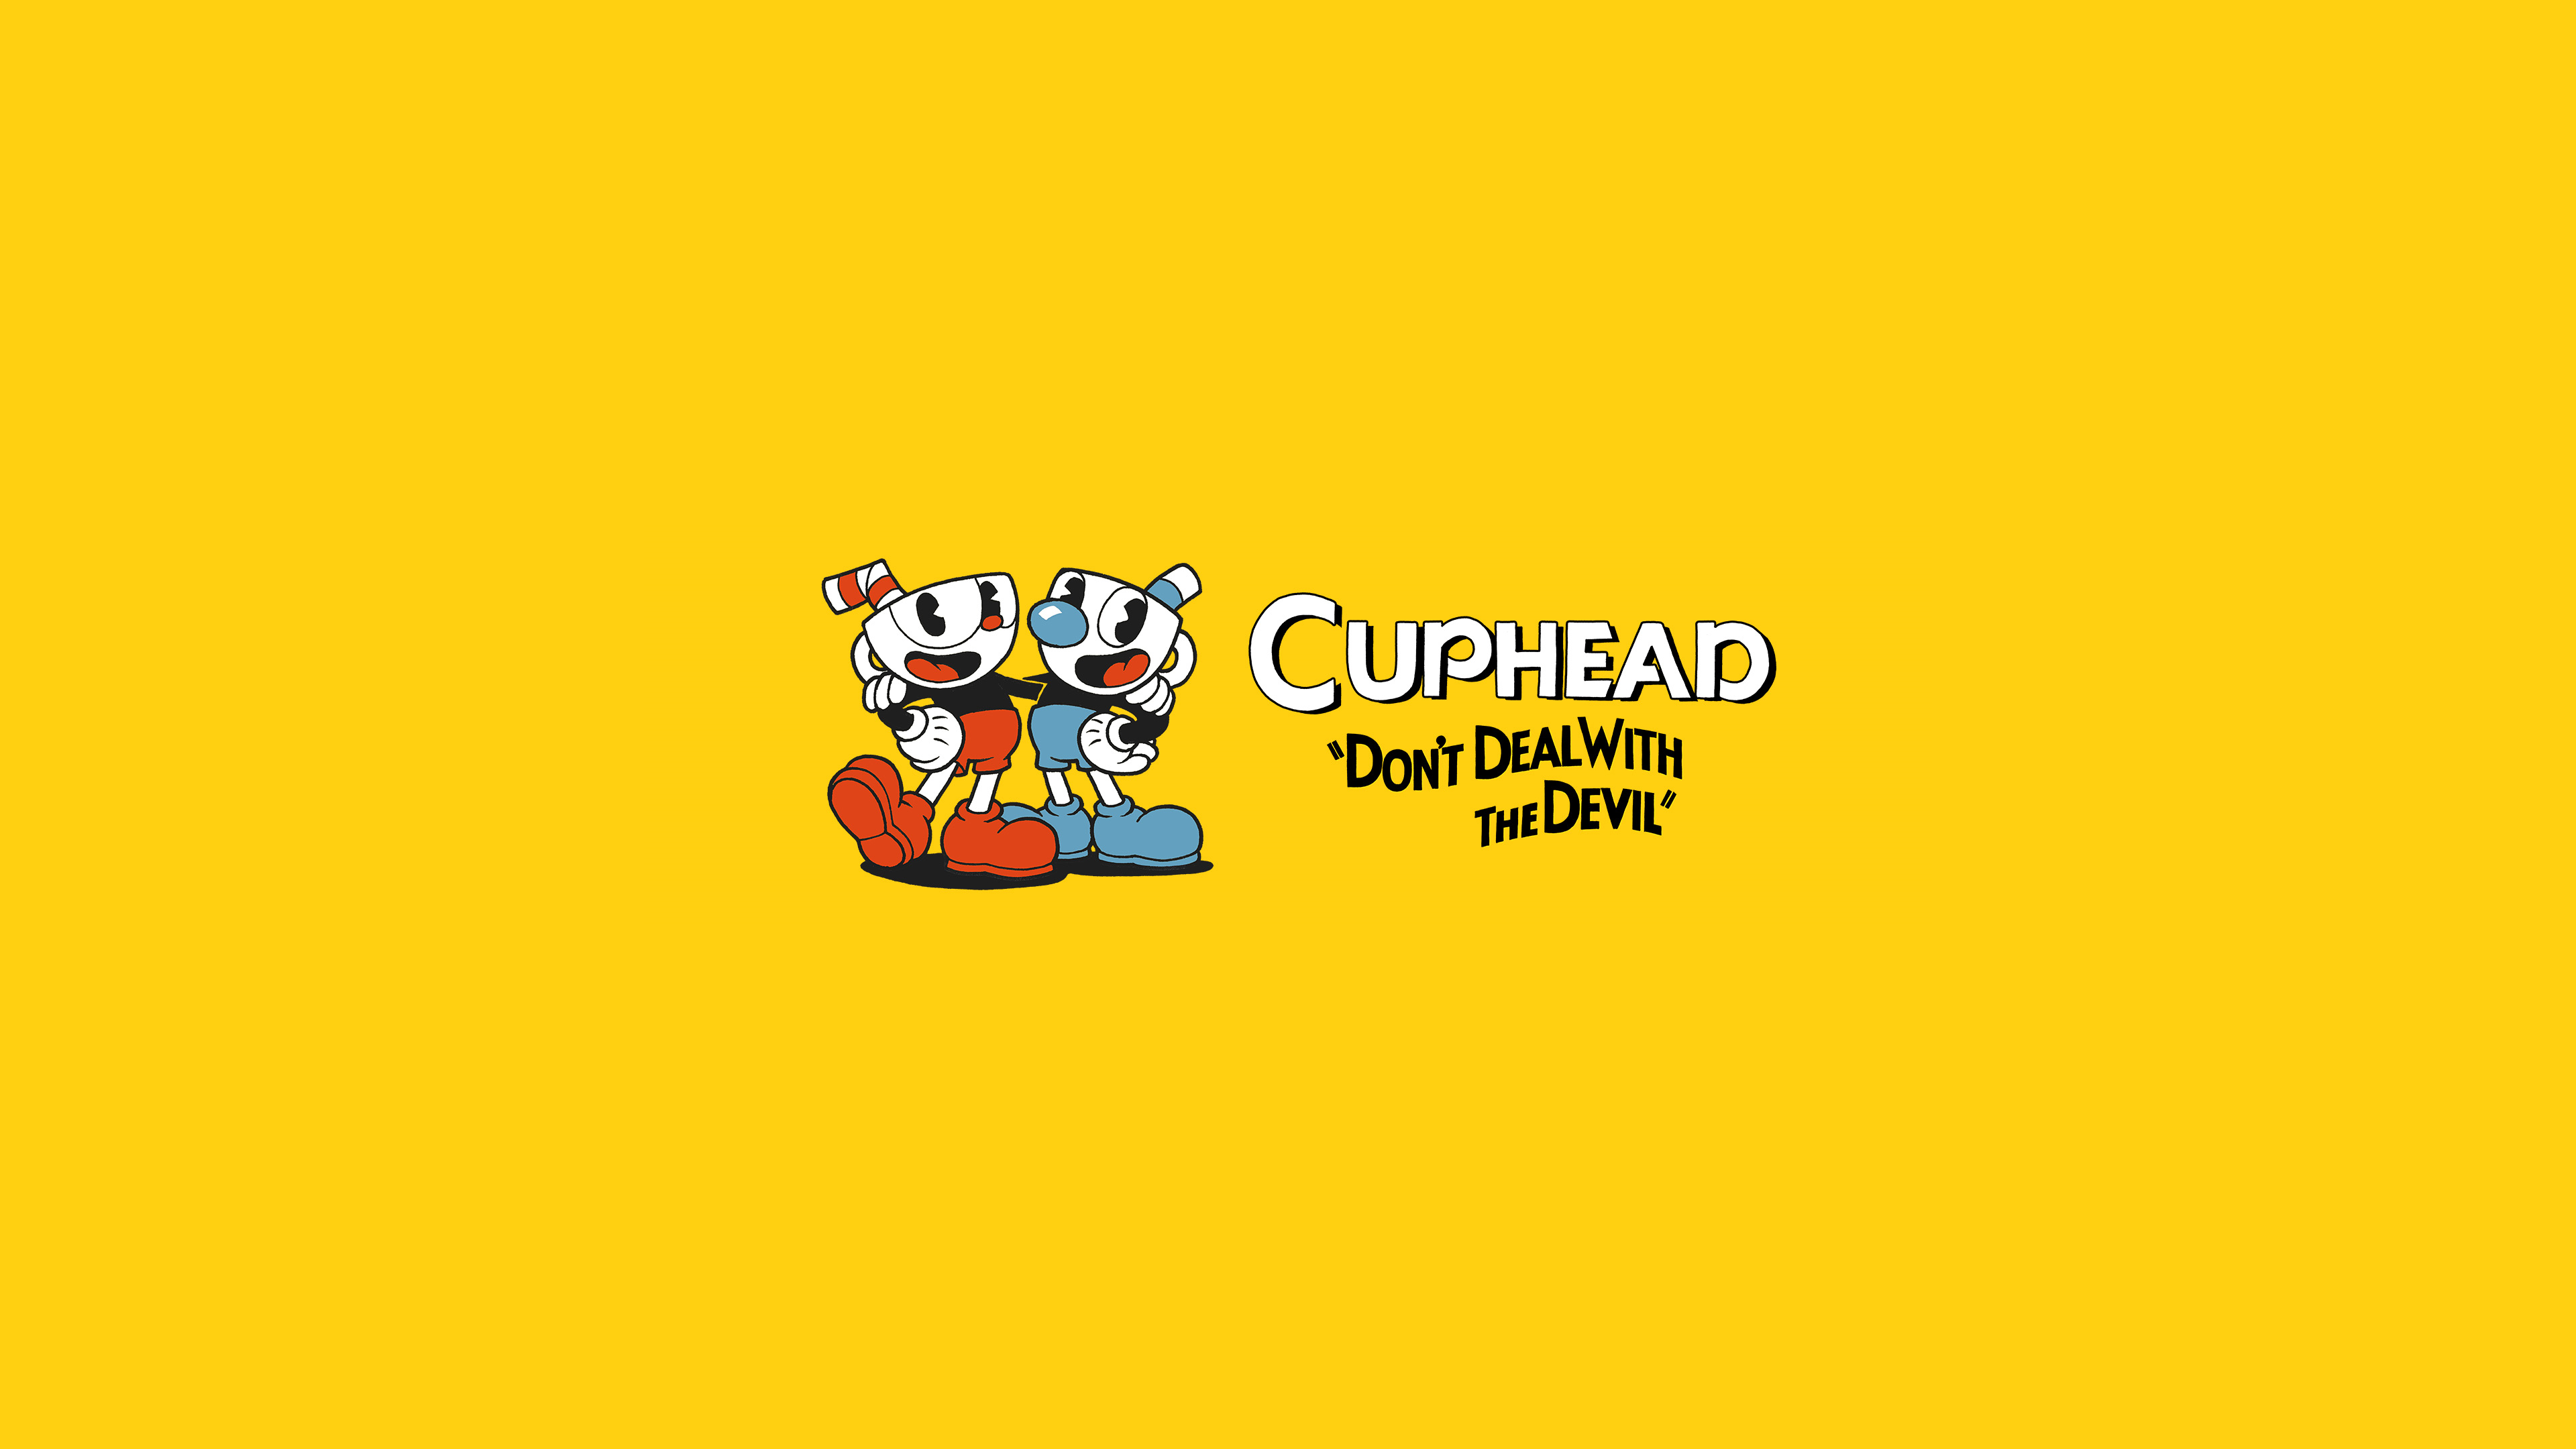 98+ Cuphead Wallpaper on WallpaperSafari